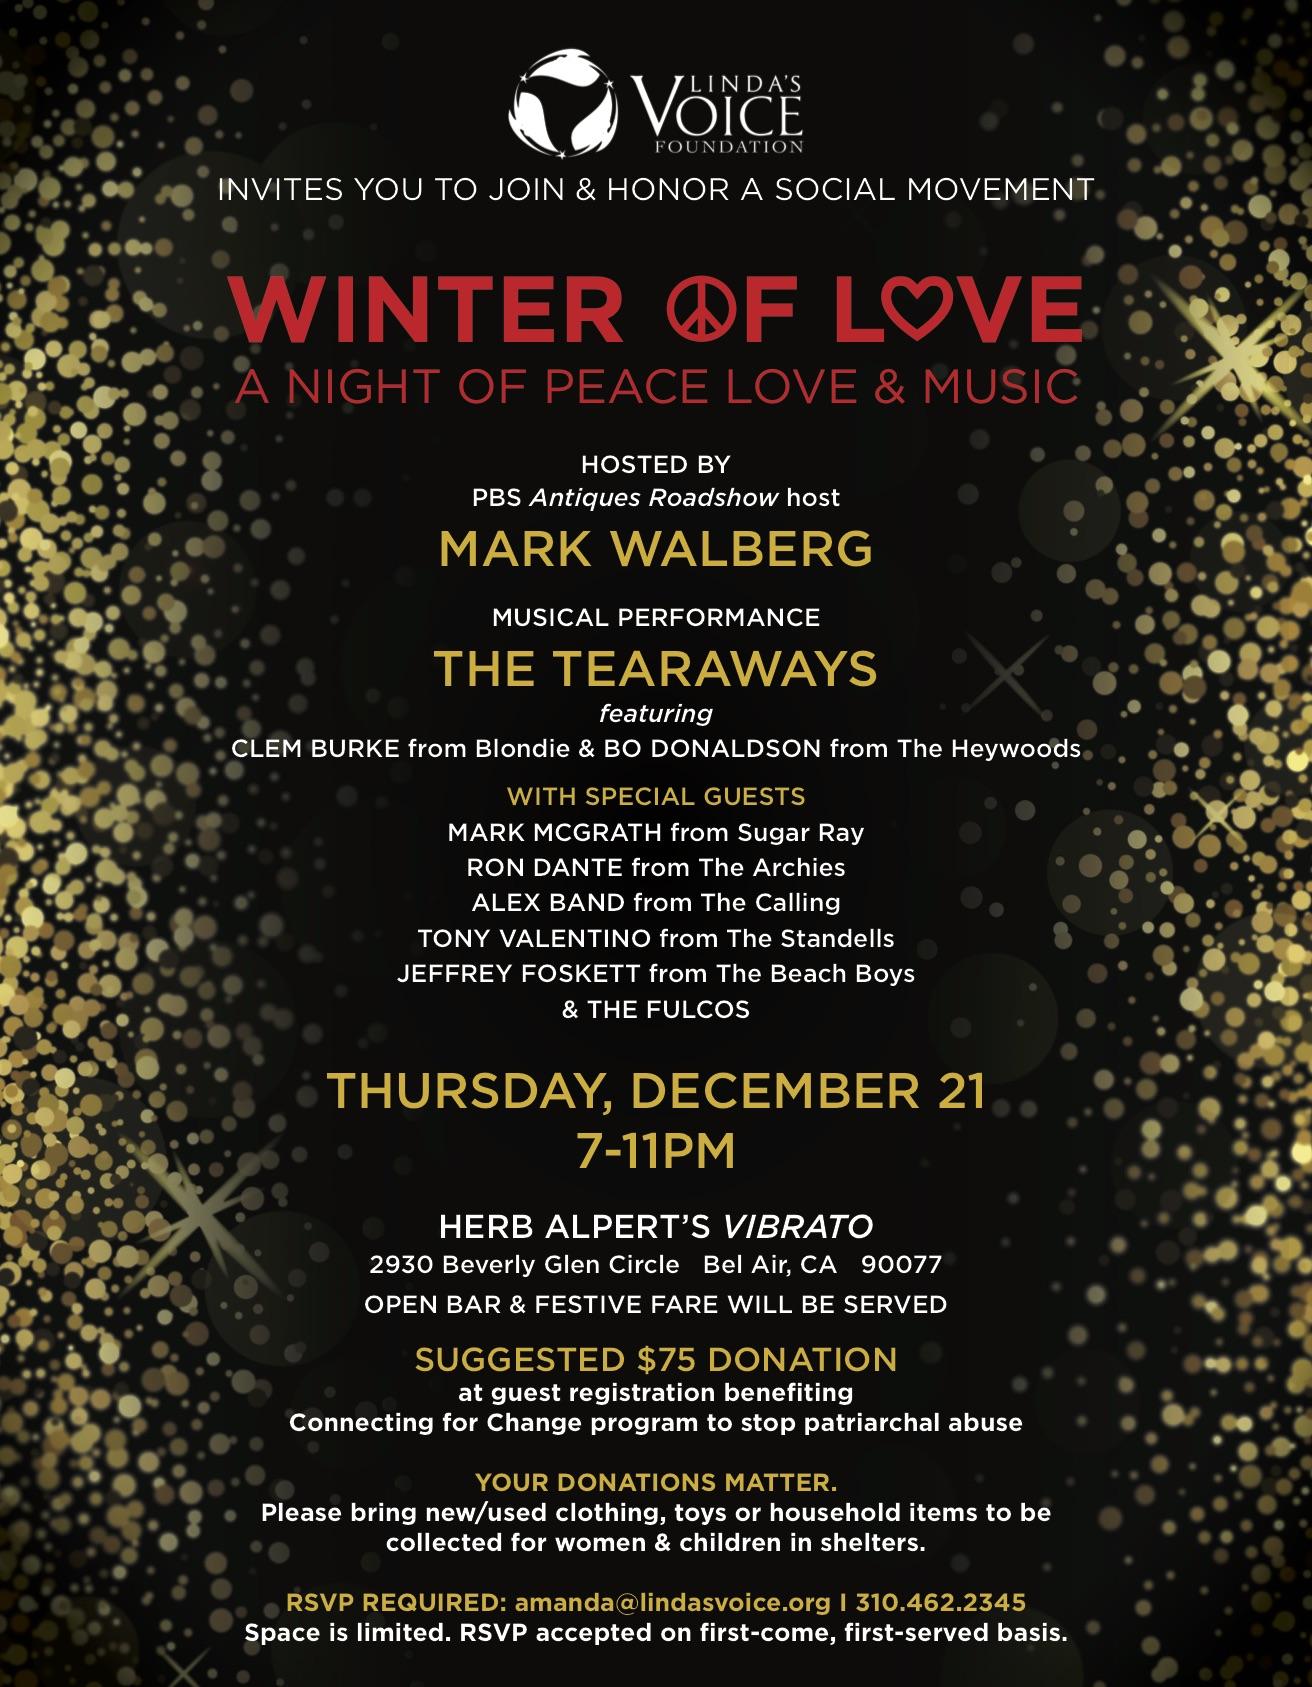 Winter-of-Love-Invite.jpg